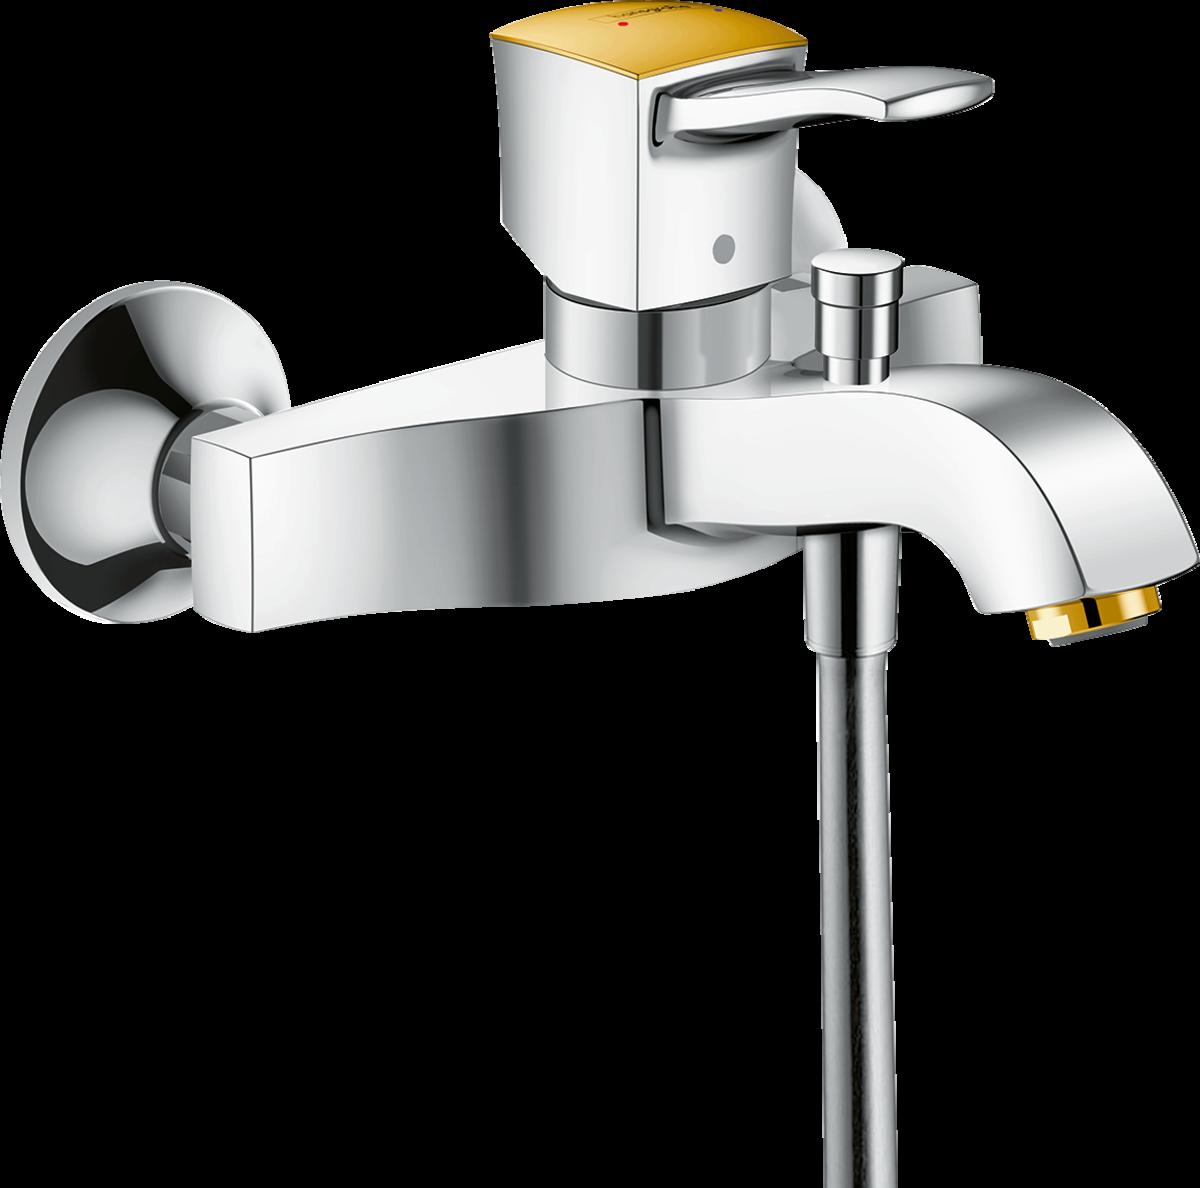 Змішувач Metropol Classic для ванни Chrome/Gold Optic (31340090)